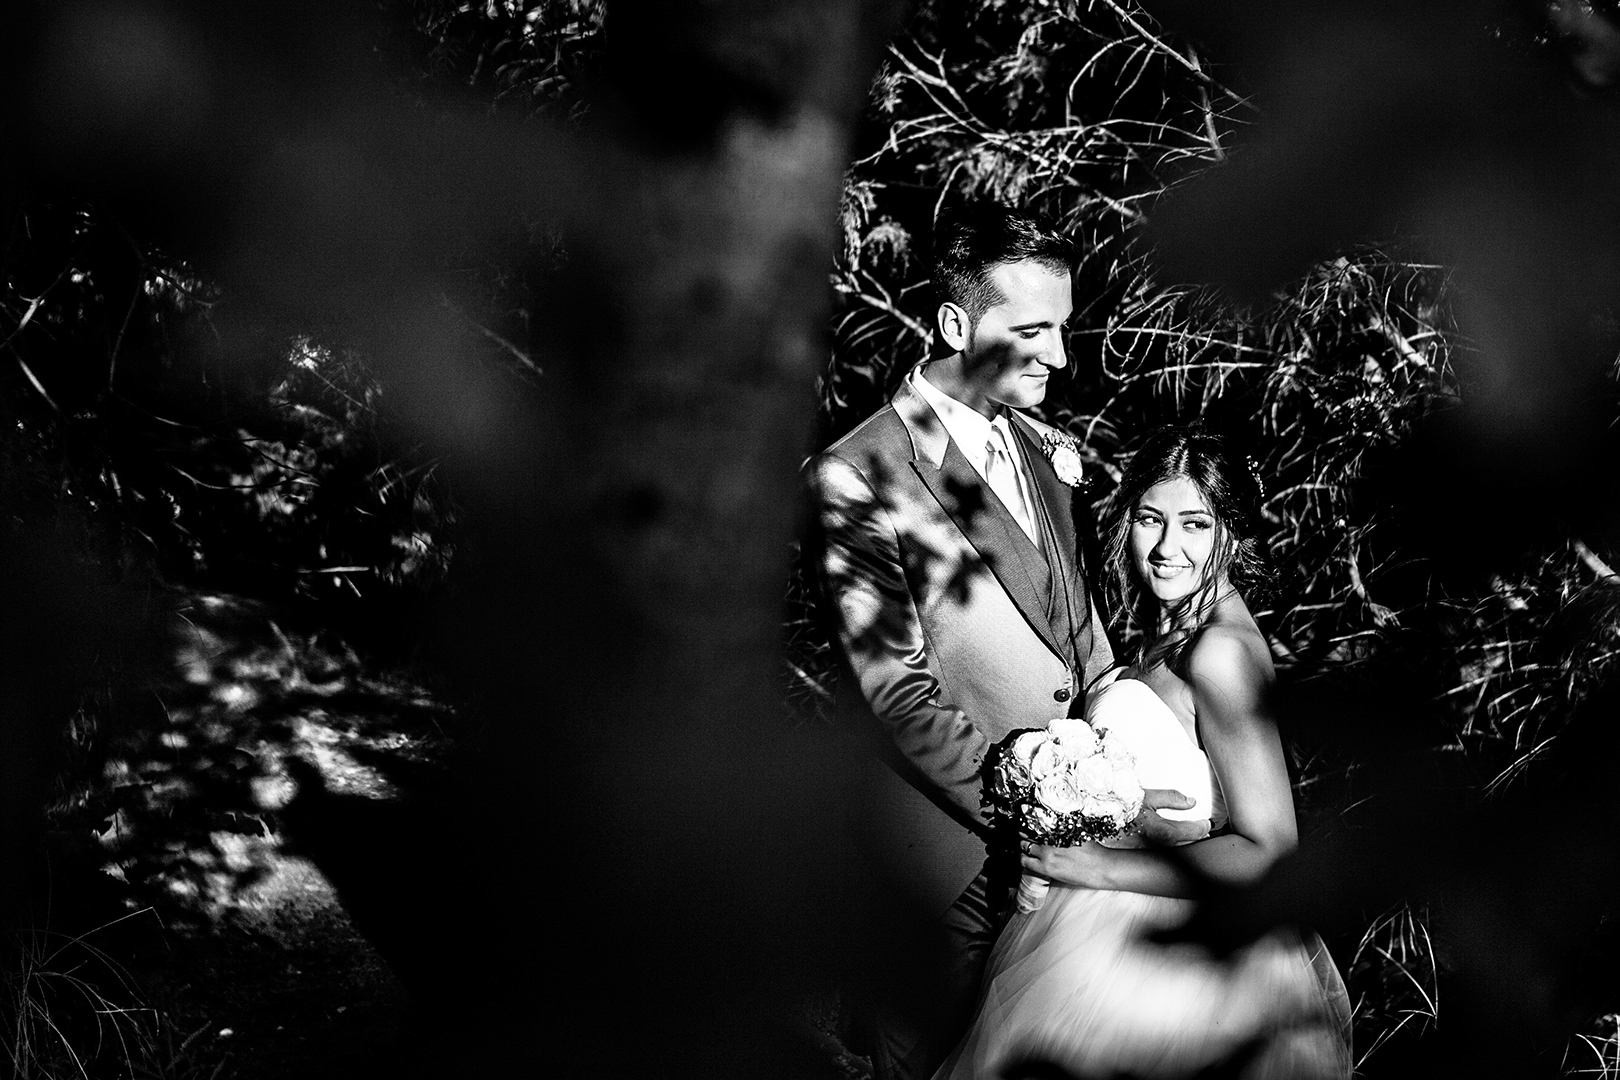 71 gianni-lepore-wedding-bianco-nero-torre-andriana-foto-sposi-bride-groom